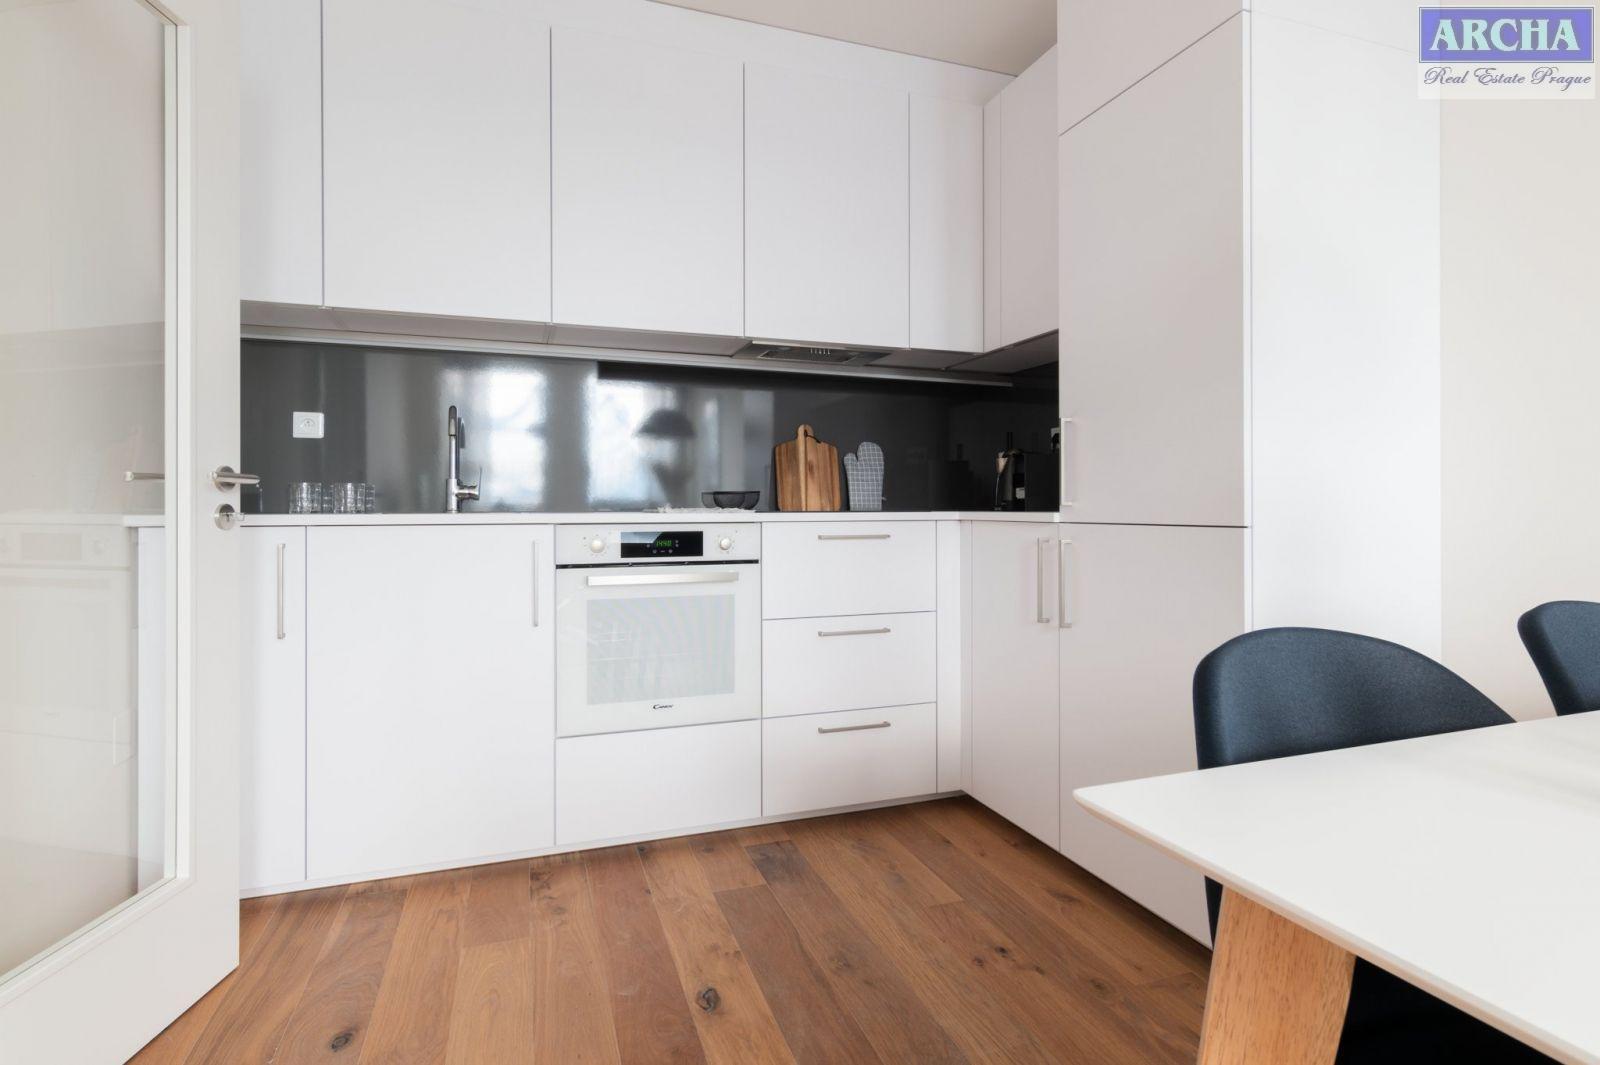 Prodej 3+kk, plocha 90,4  m2, terasa, 4.NP, Praha 2 Vinohrady